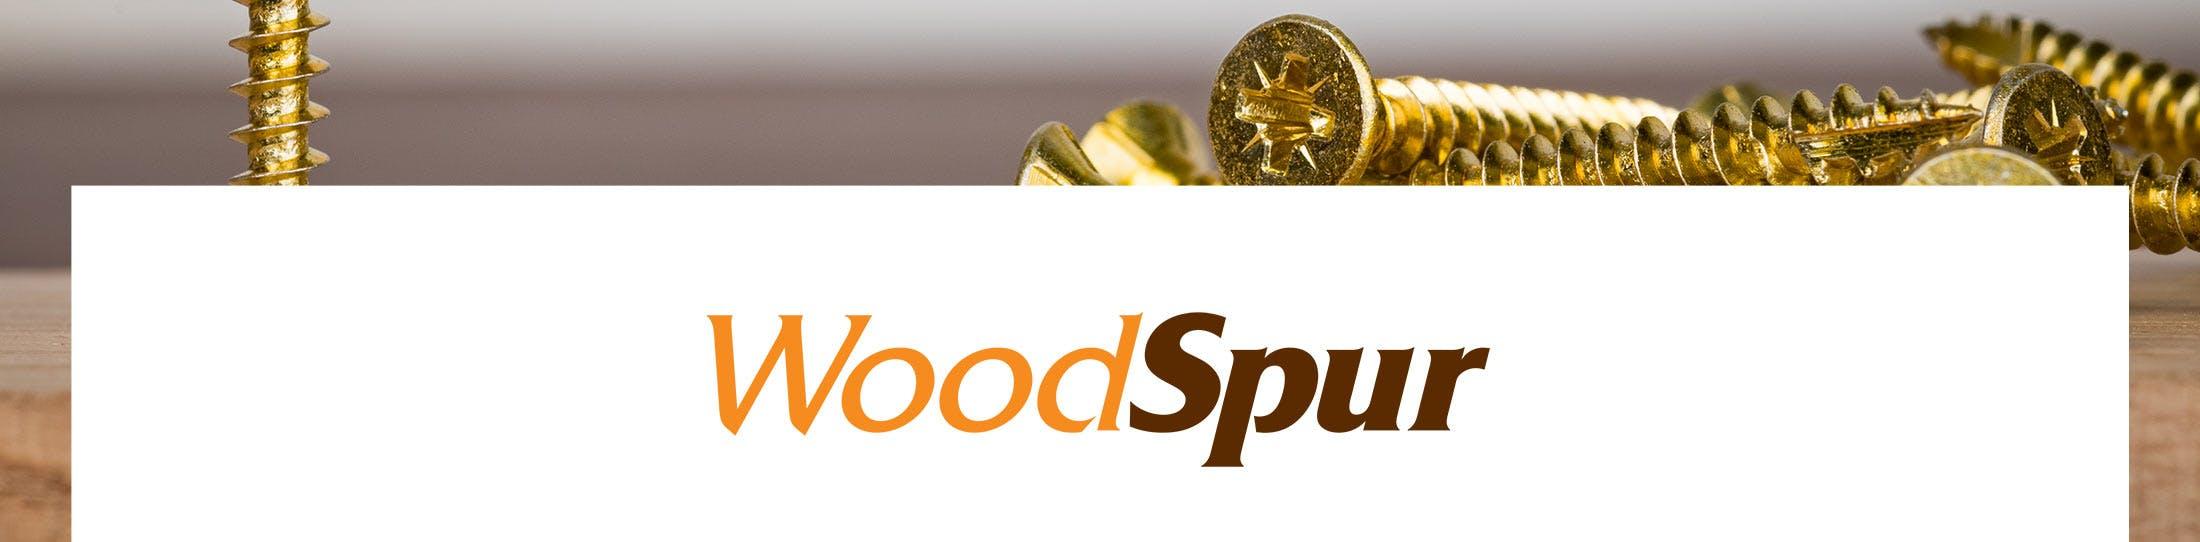 Woodspur